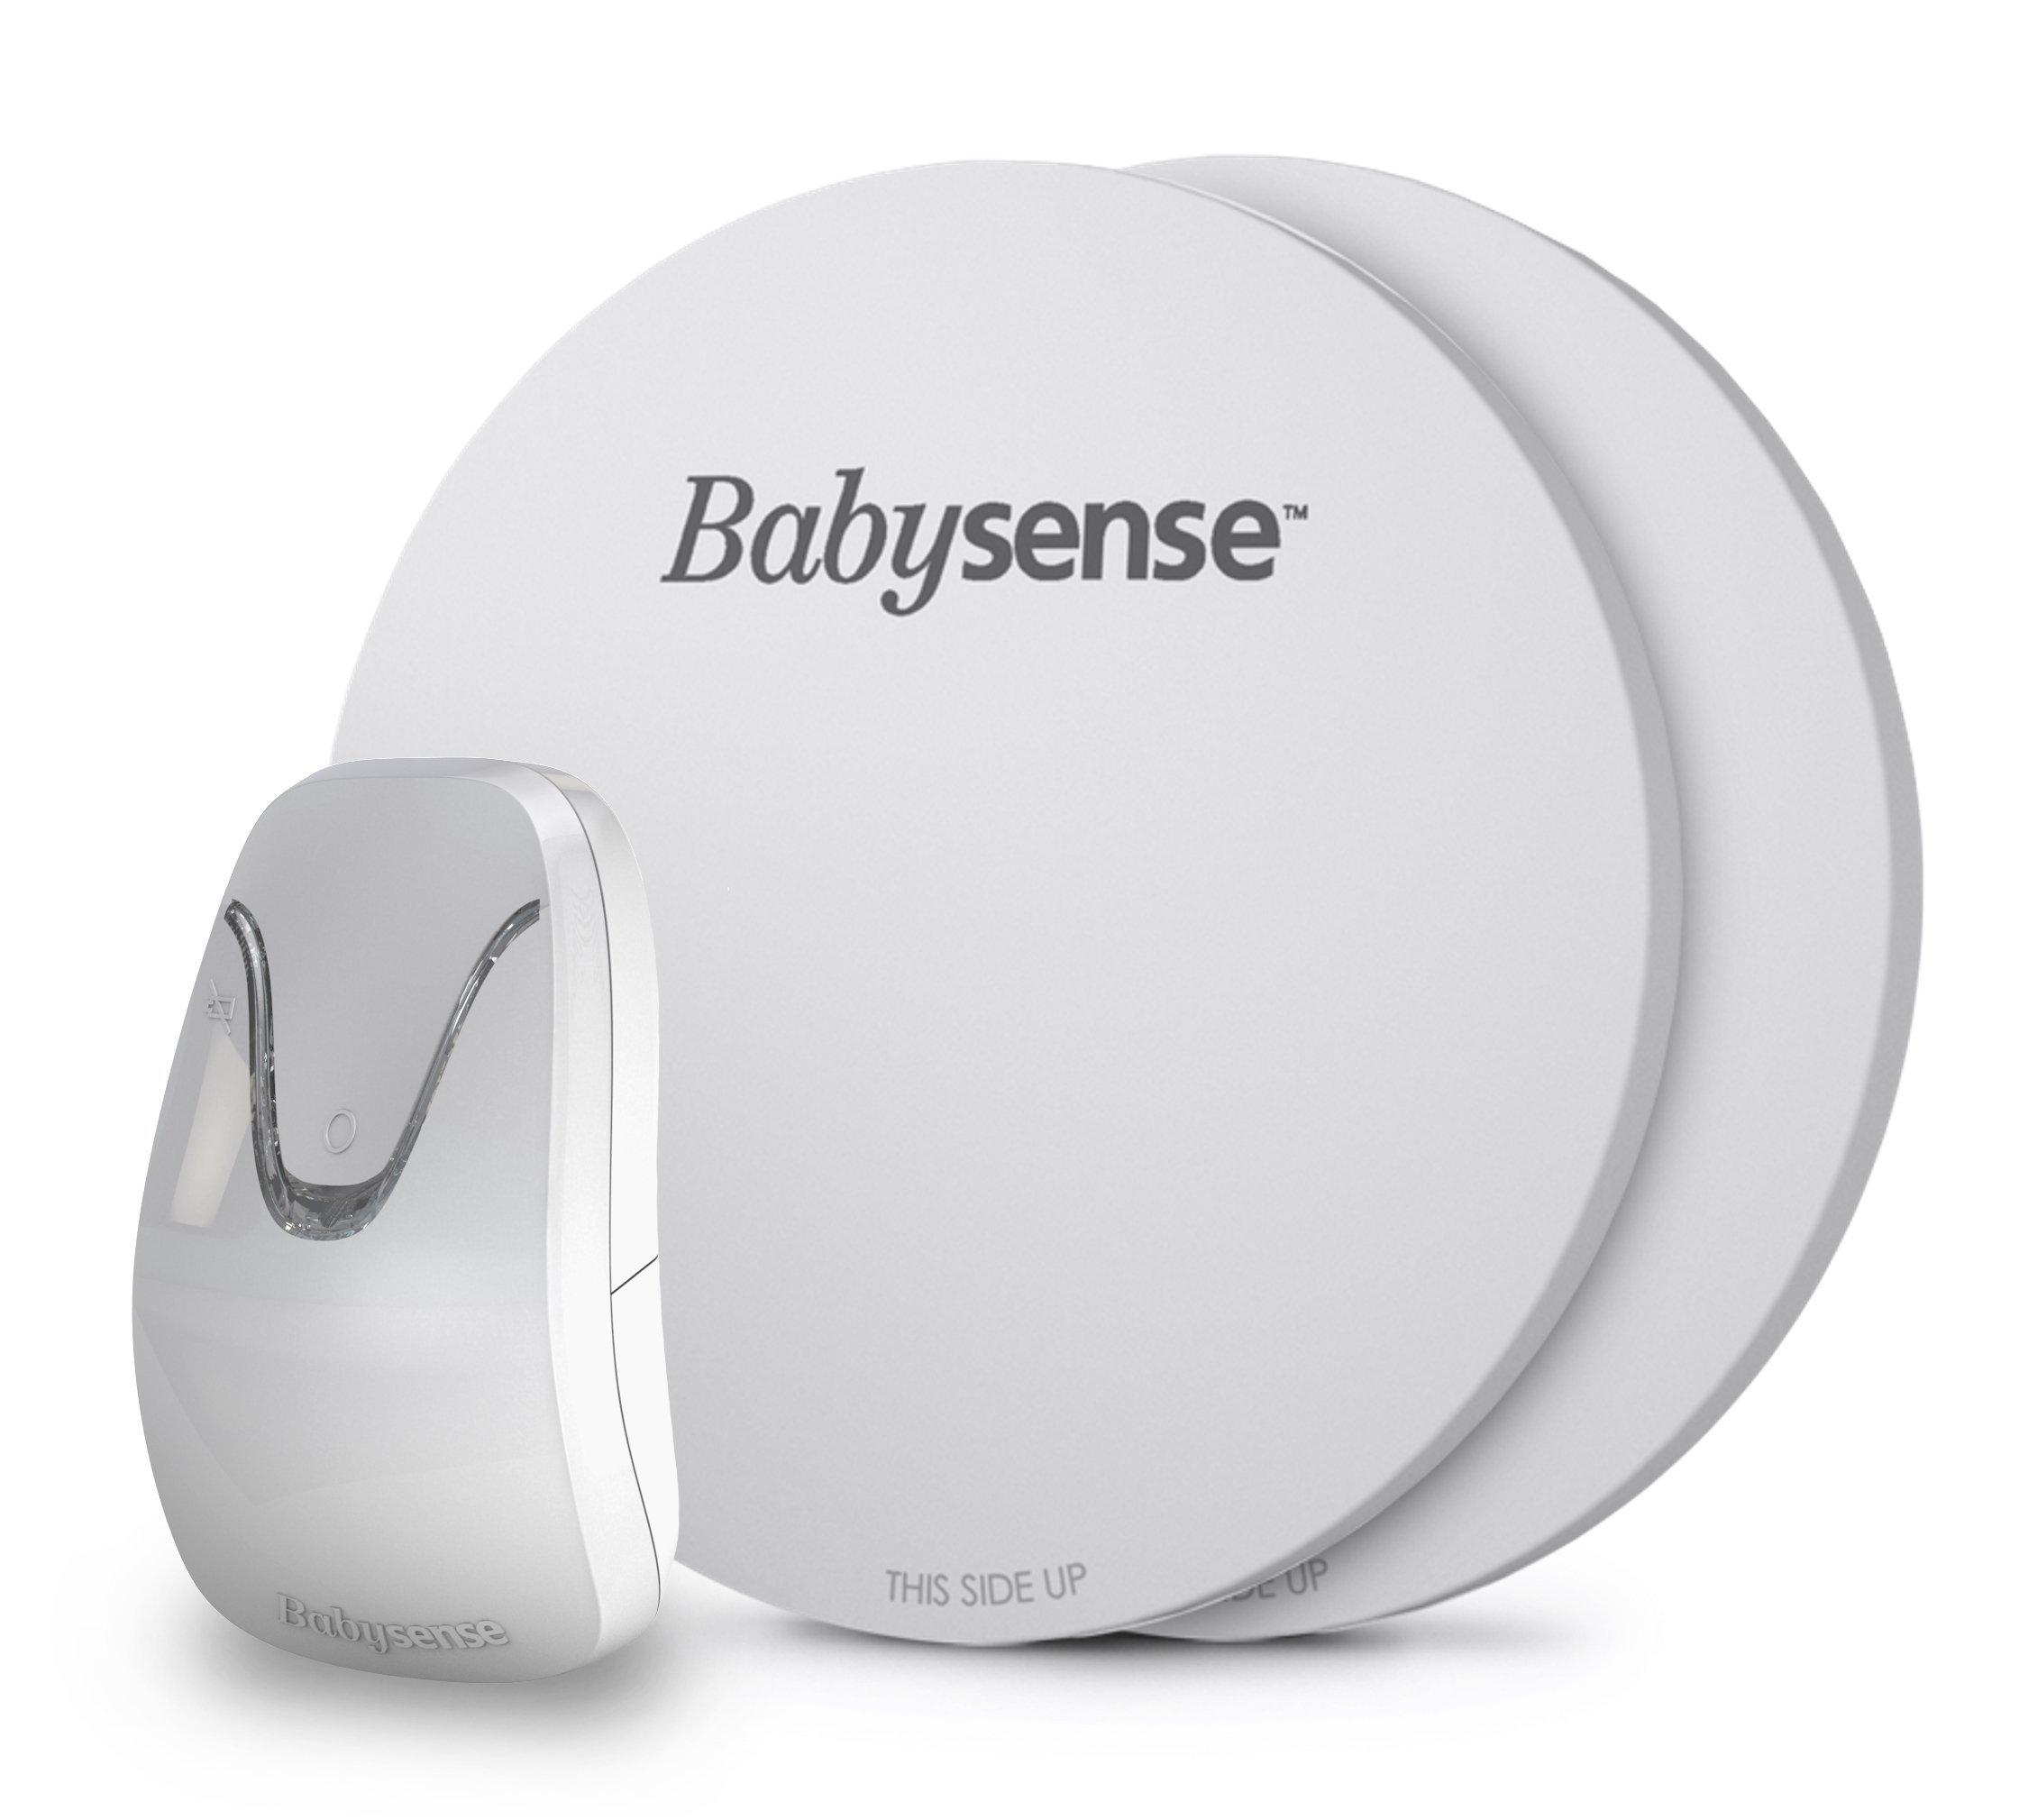 New Model: Babysense Video + Baby Movement Monitor - Bundle Pack: Babysense Video Baby Monitor with Babysense 7 Under-The-Mattress Baby Movement Monitor - 2 in 1 by Babysense (Image #2)